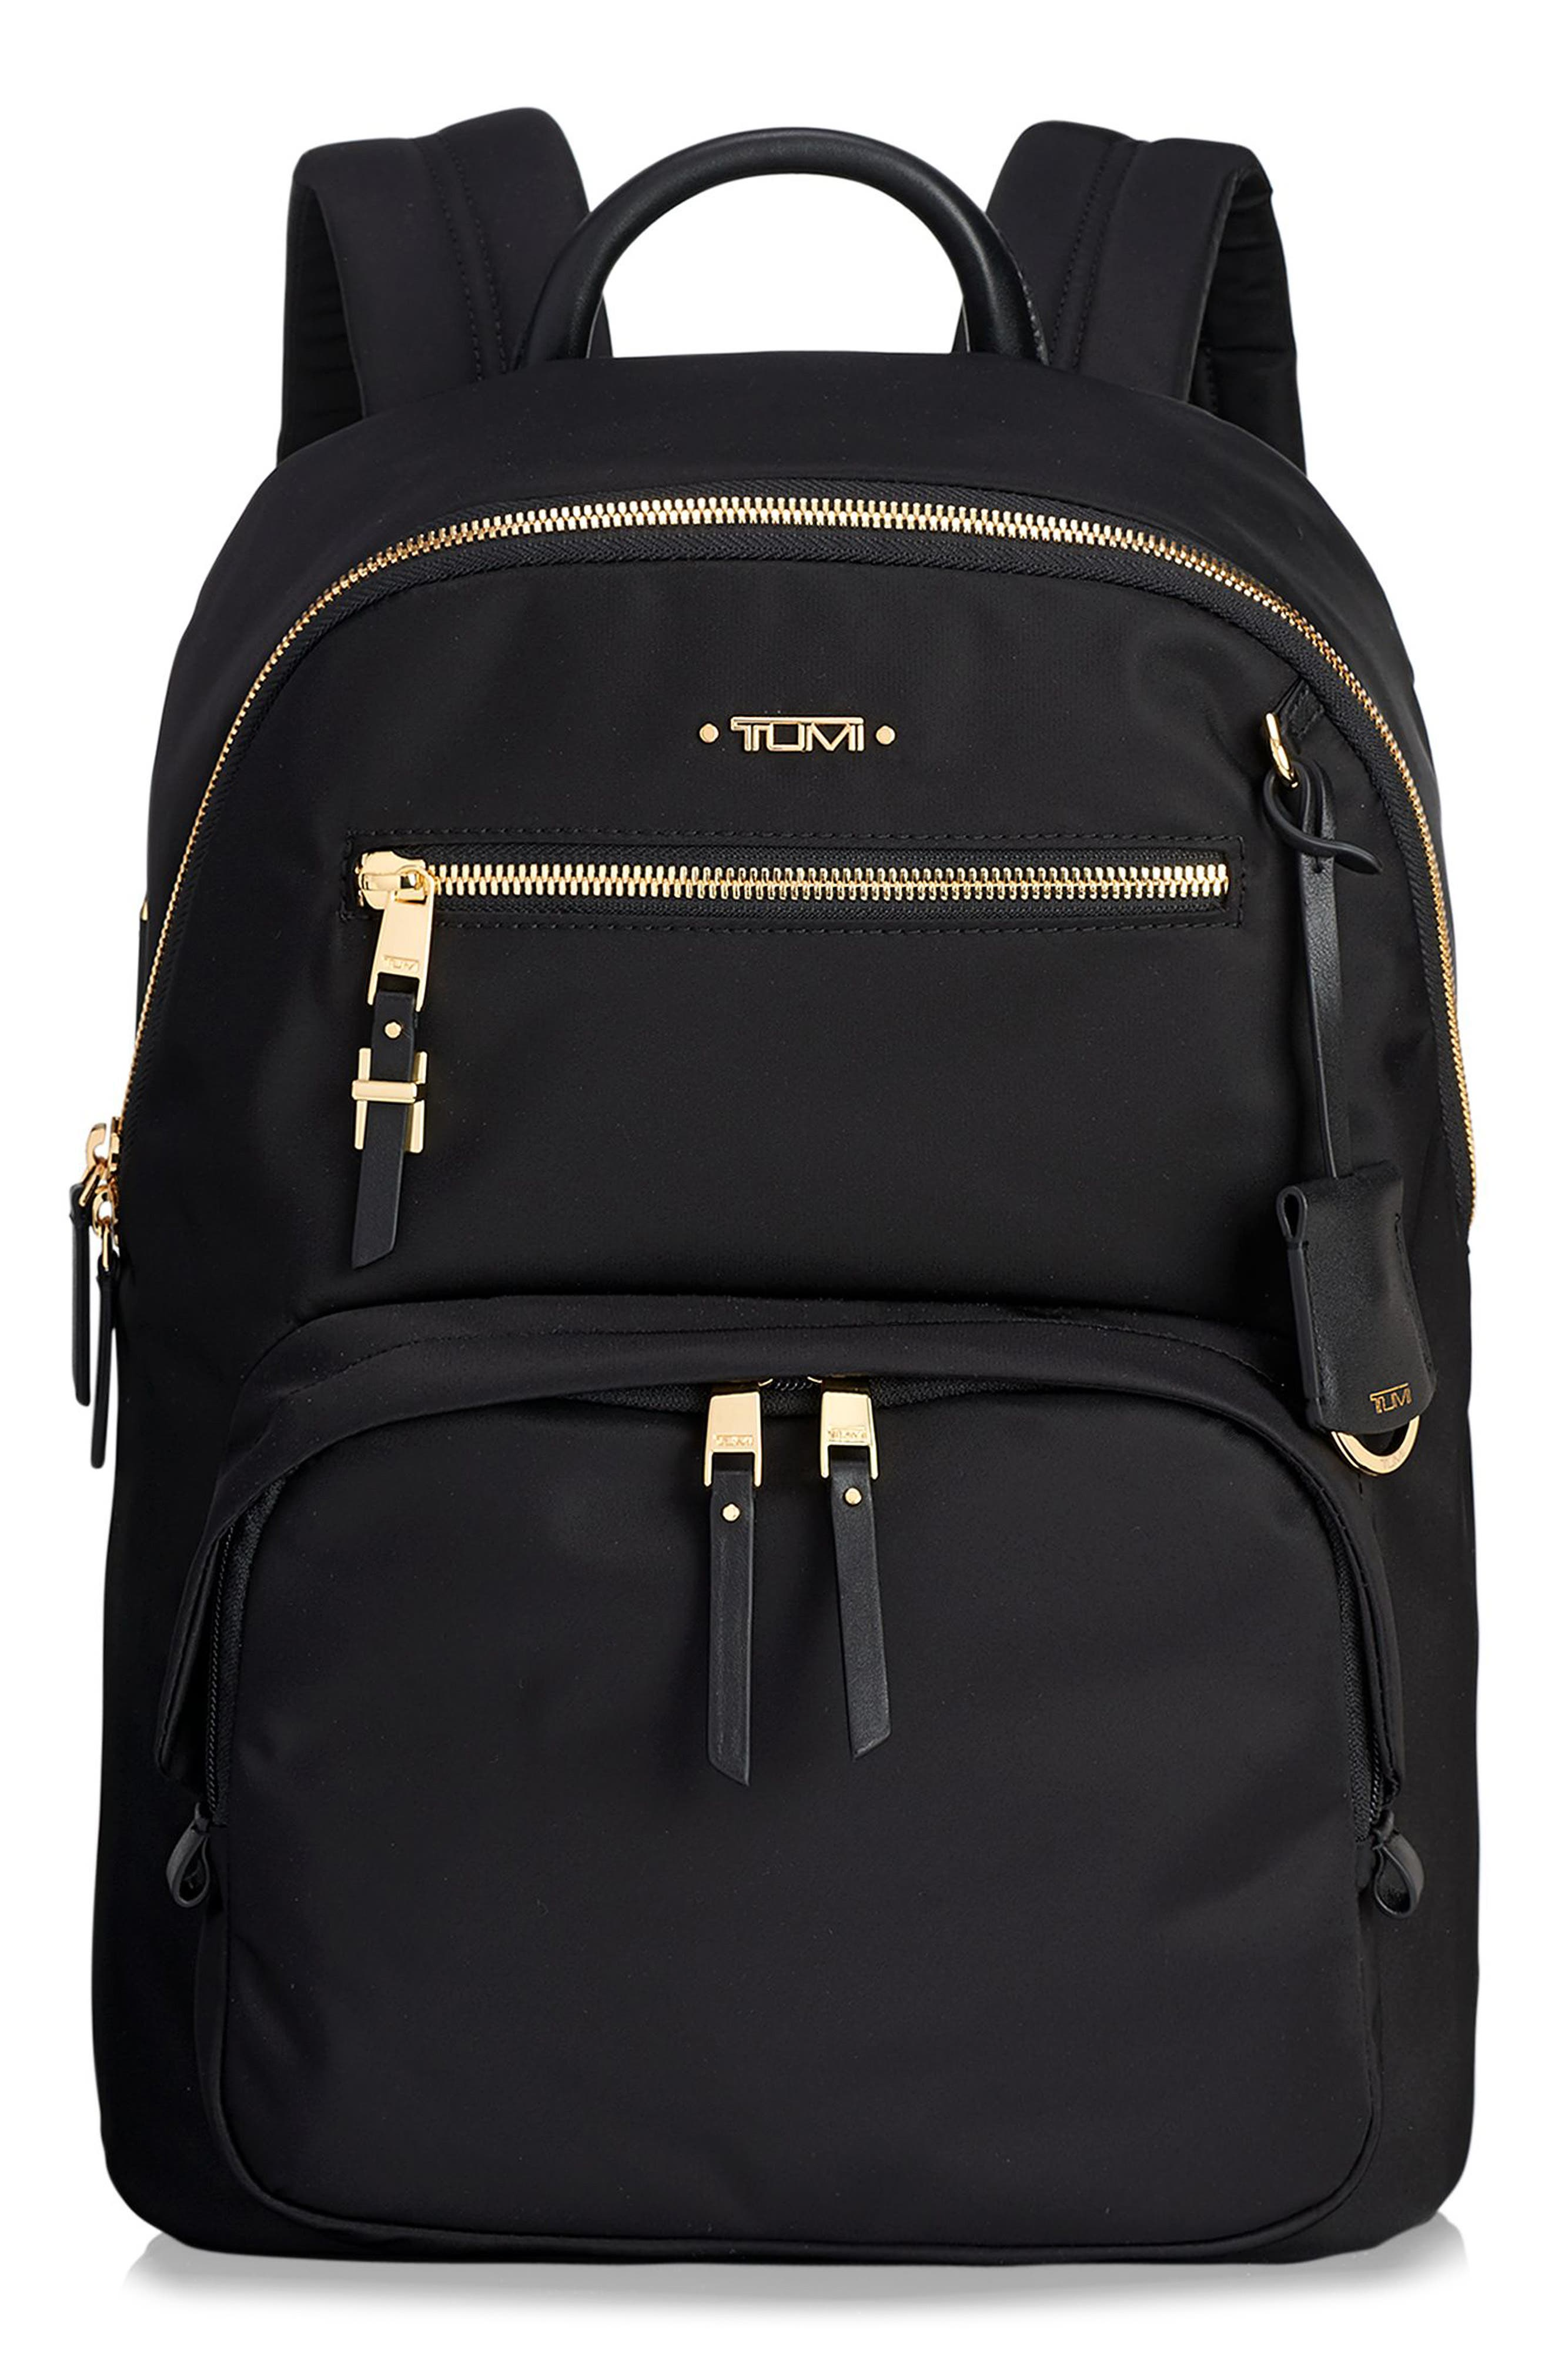 Voyageur Hagen Nylon Backpack,                         Main,                         color, BLACK